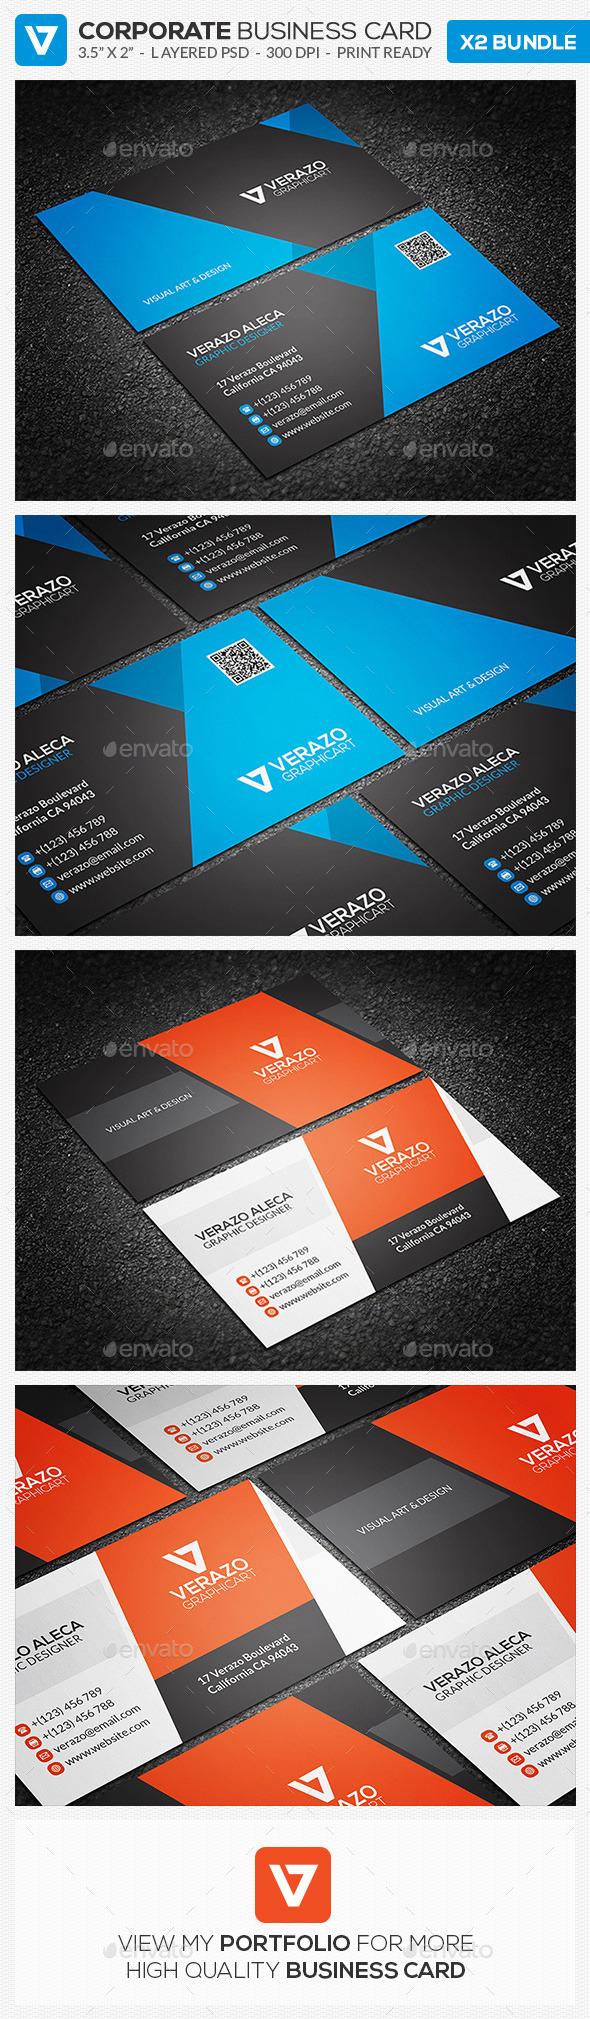 Business Card Bundle 15 - Corporate Business Cards